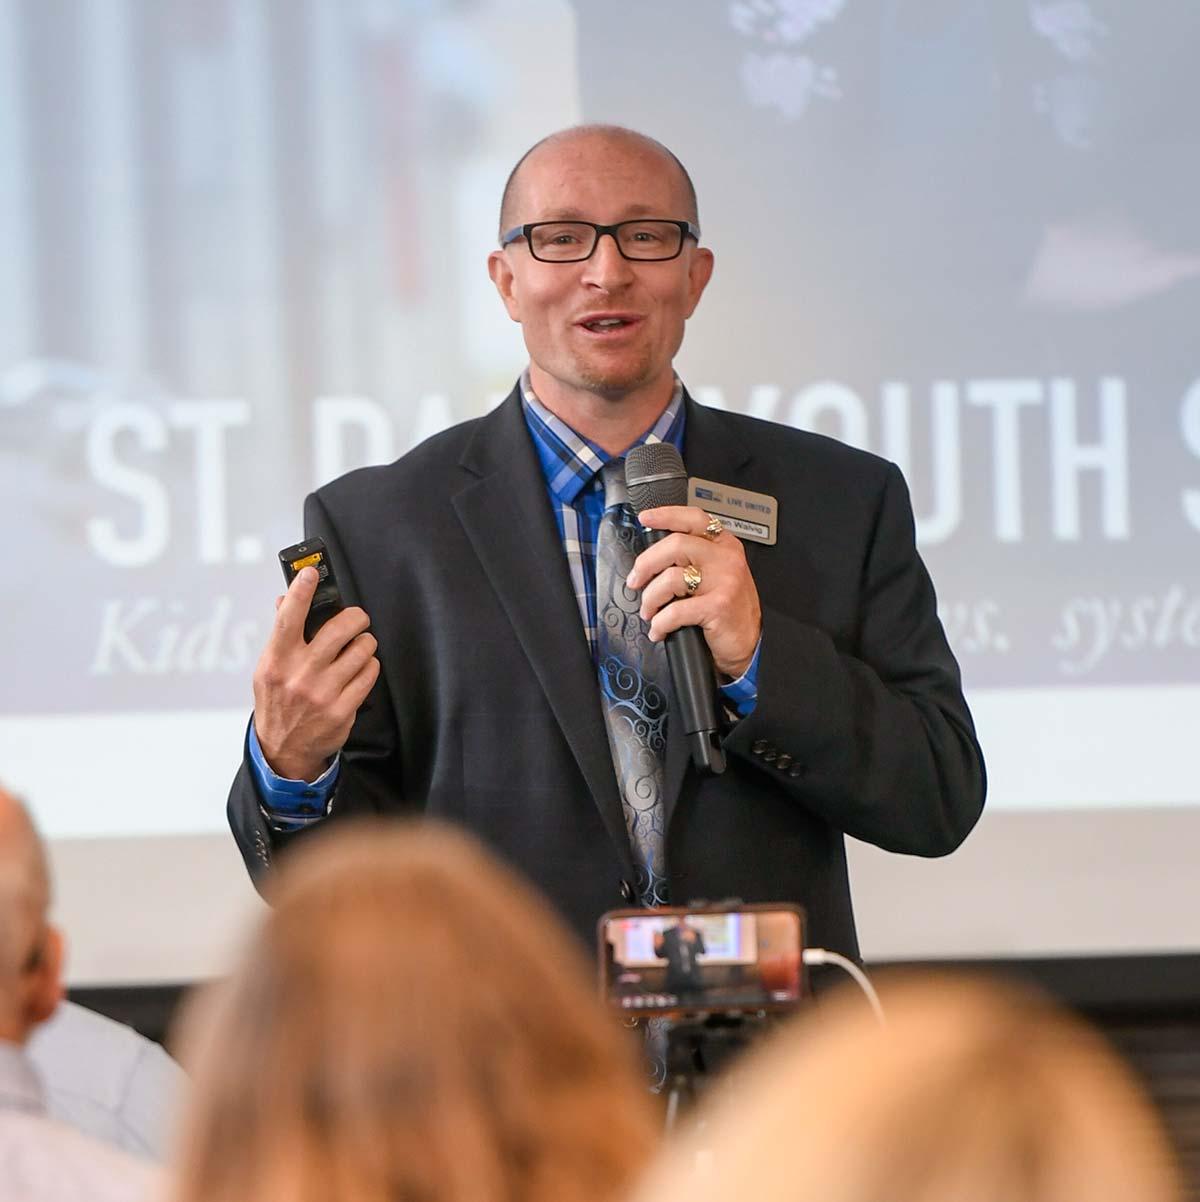 Steven Walvig speaking at United Way's Community Insight Session Sept 2019